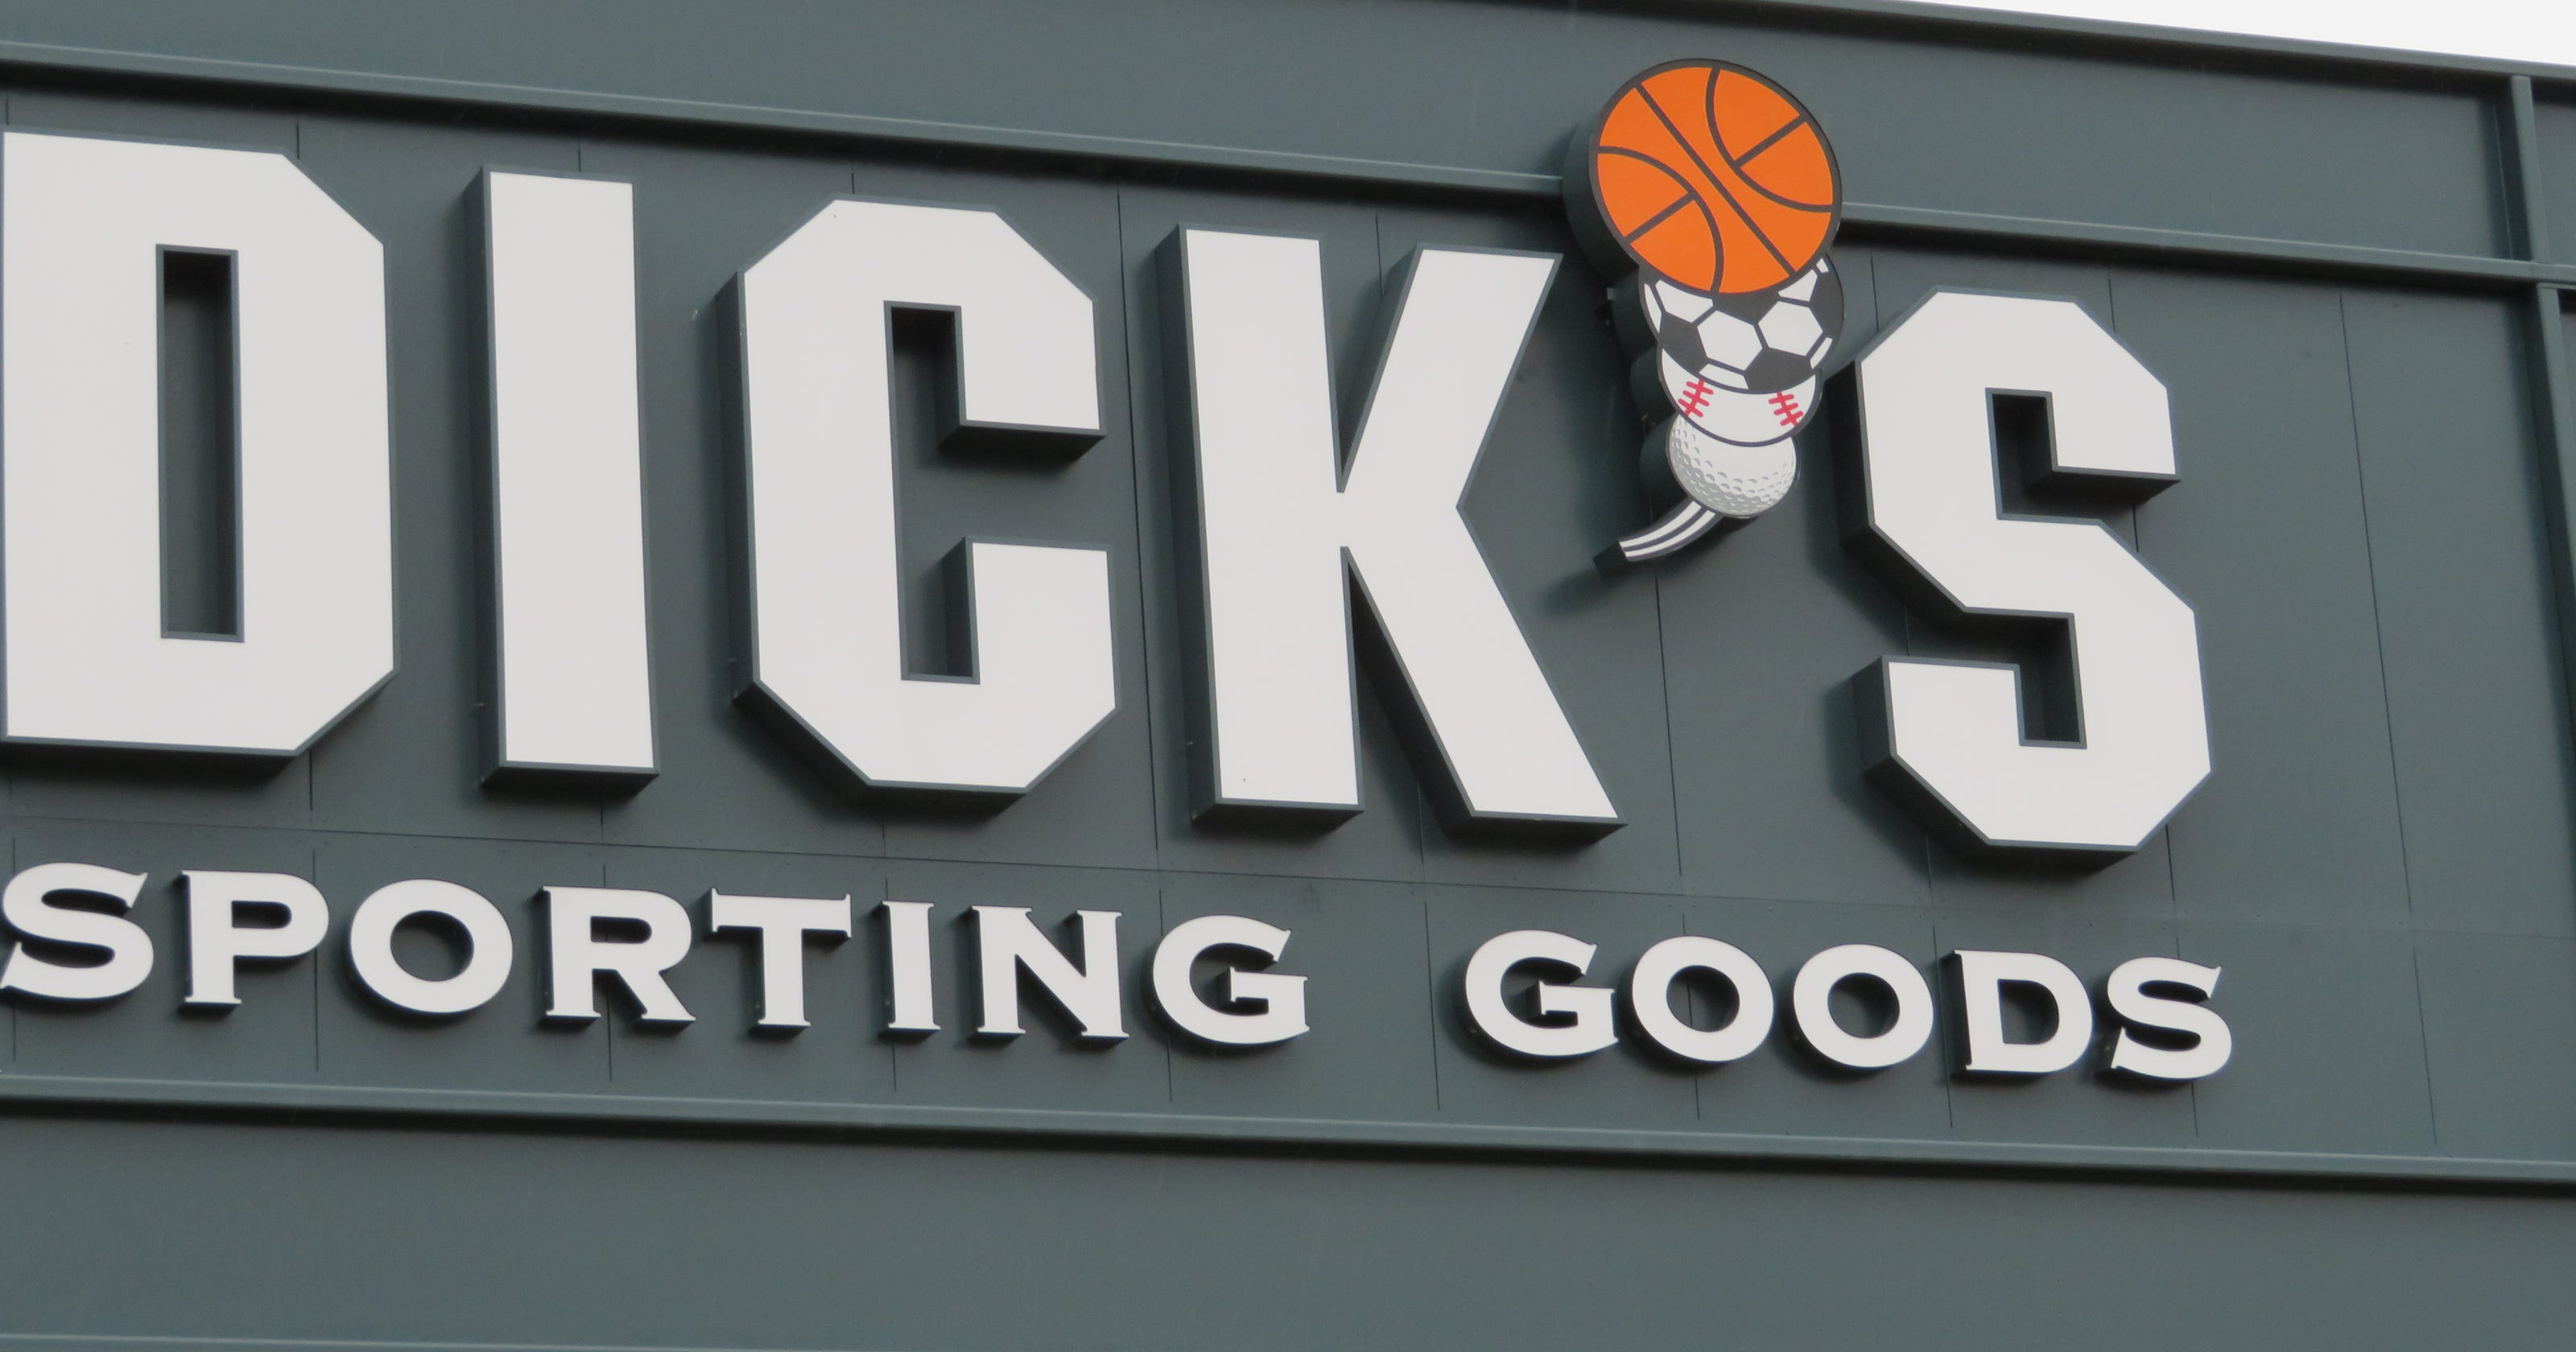 a463befad52cd3 Dick s Sporting Goods posts higher earnings despite sales decline